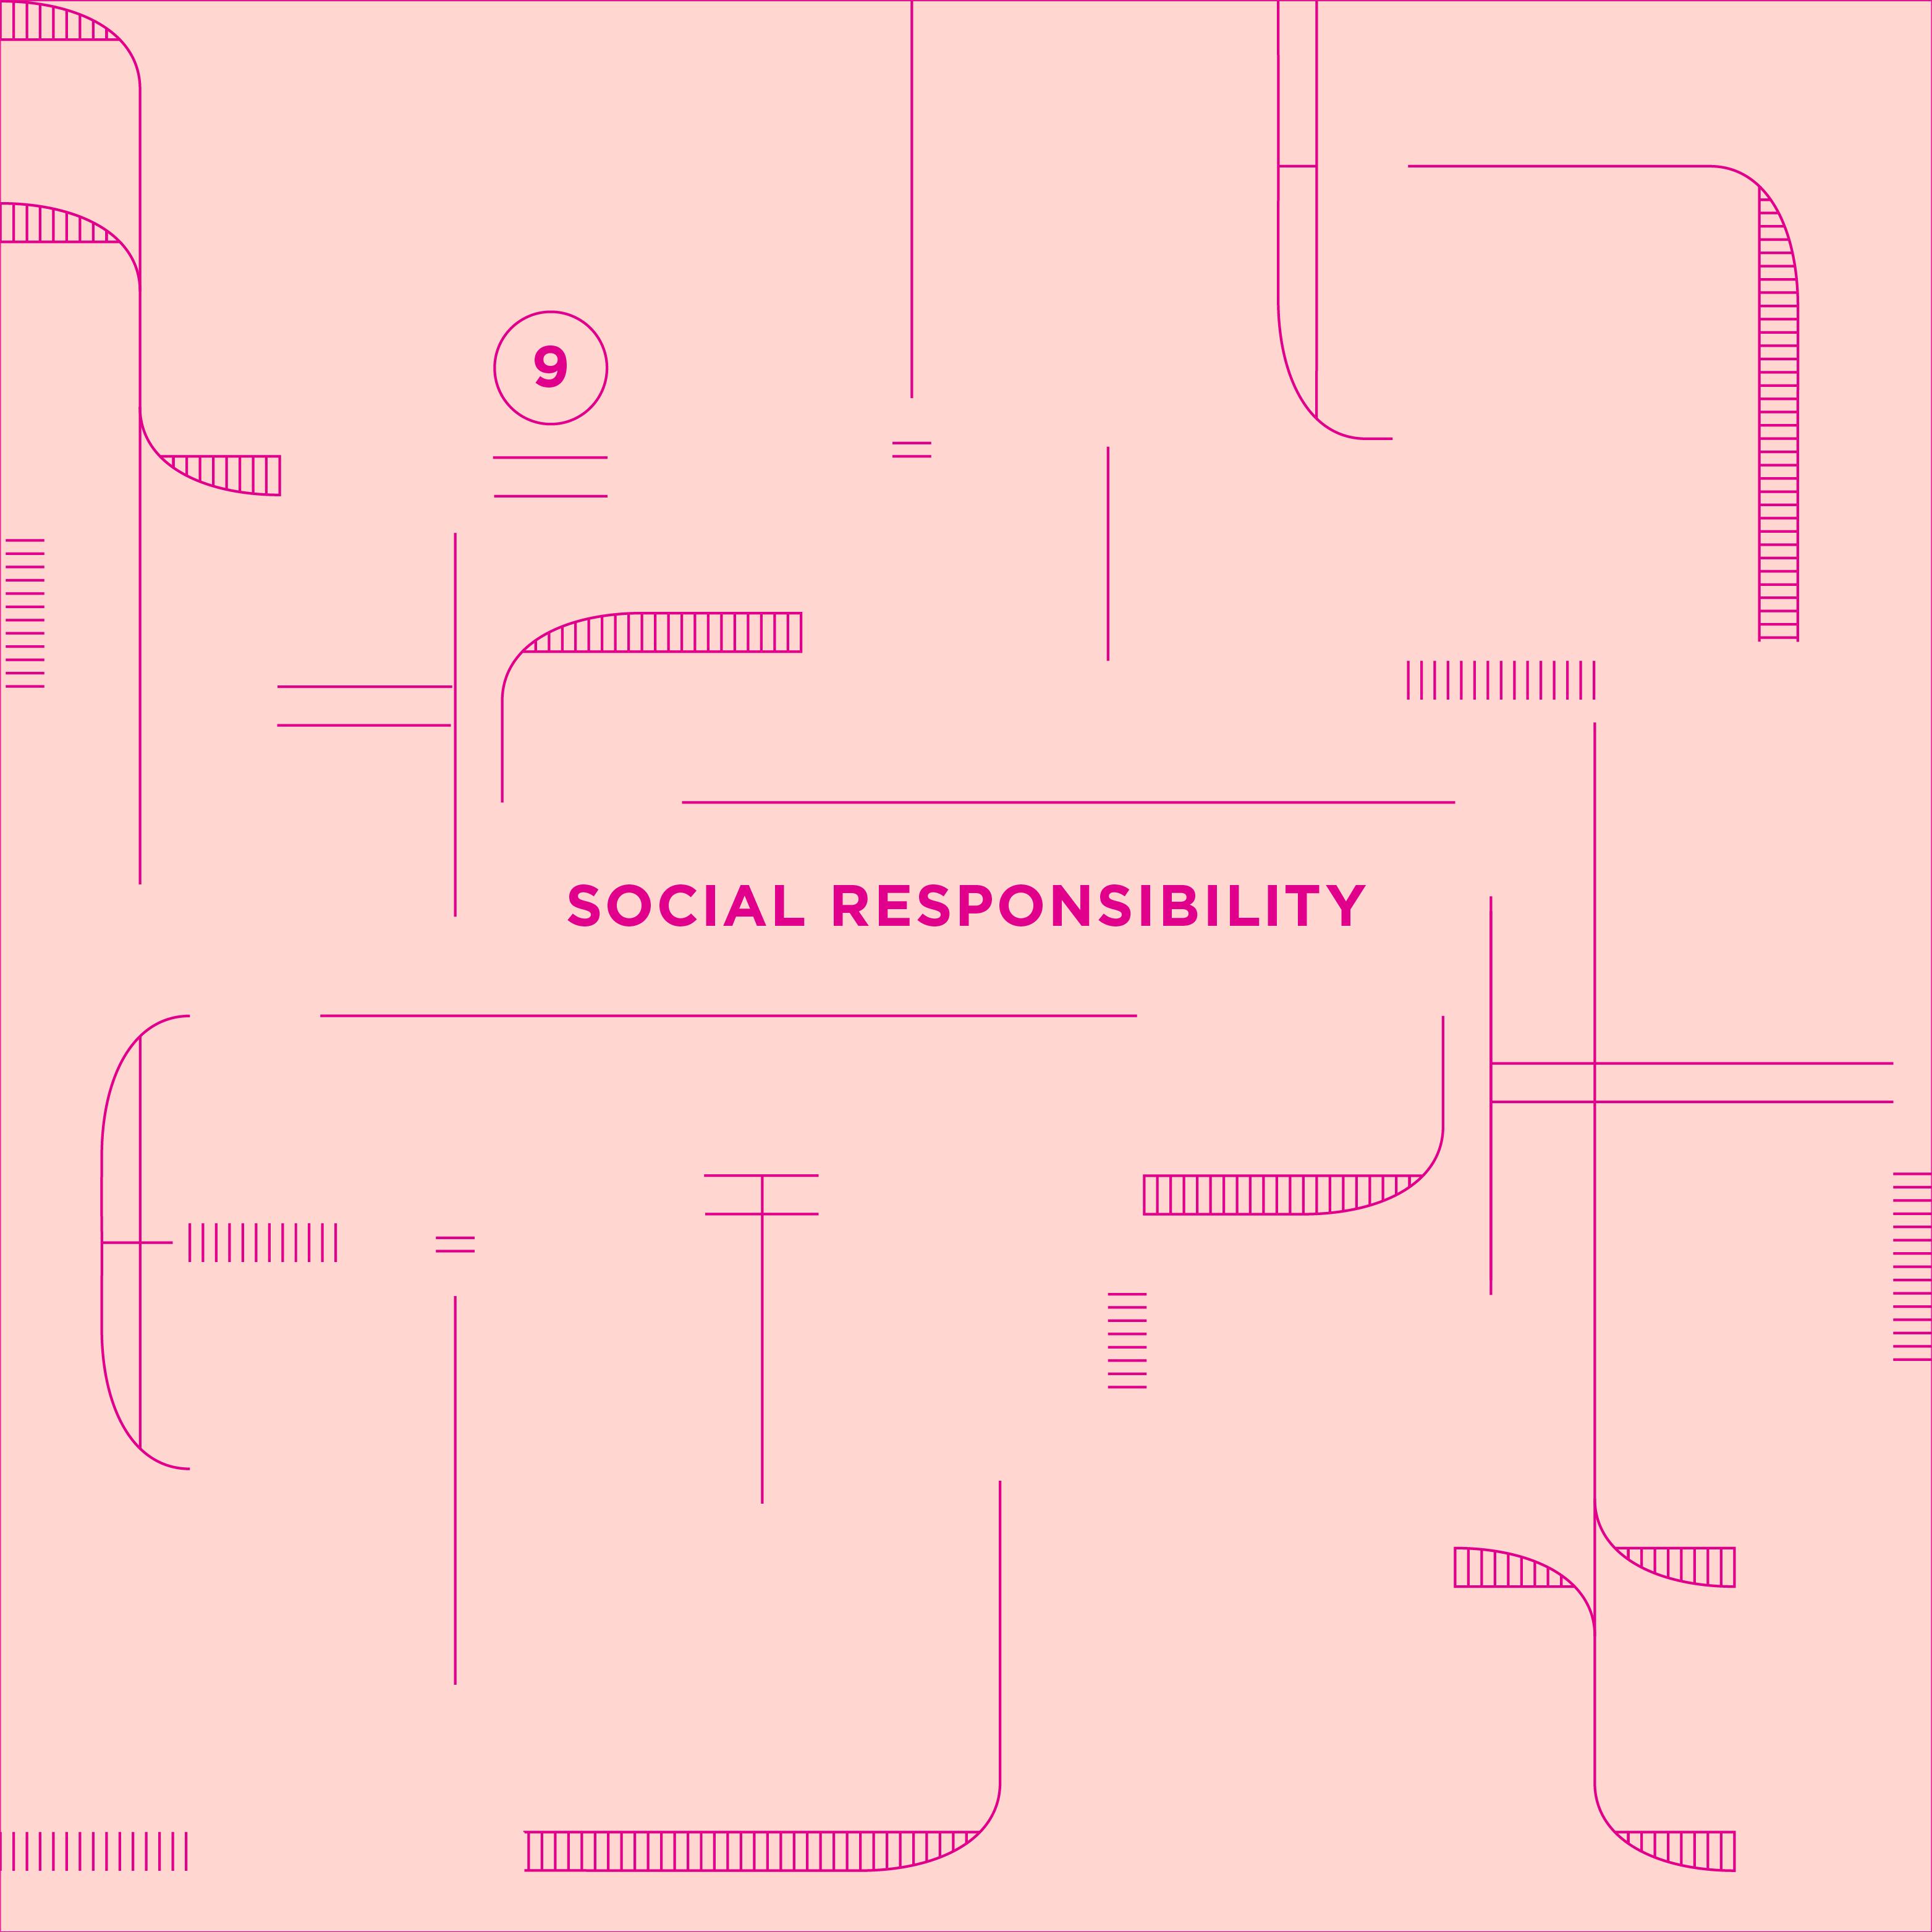 9. Social Responsibility